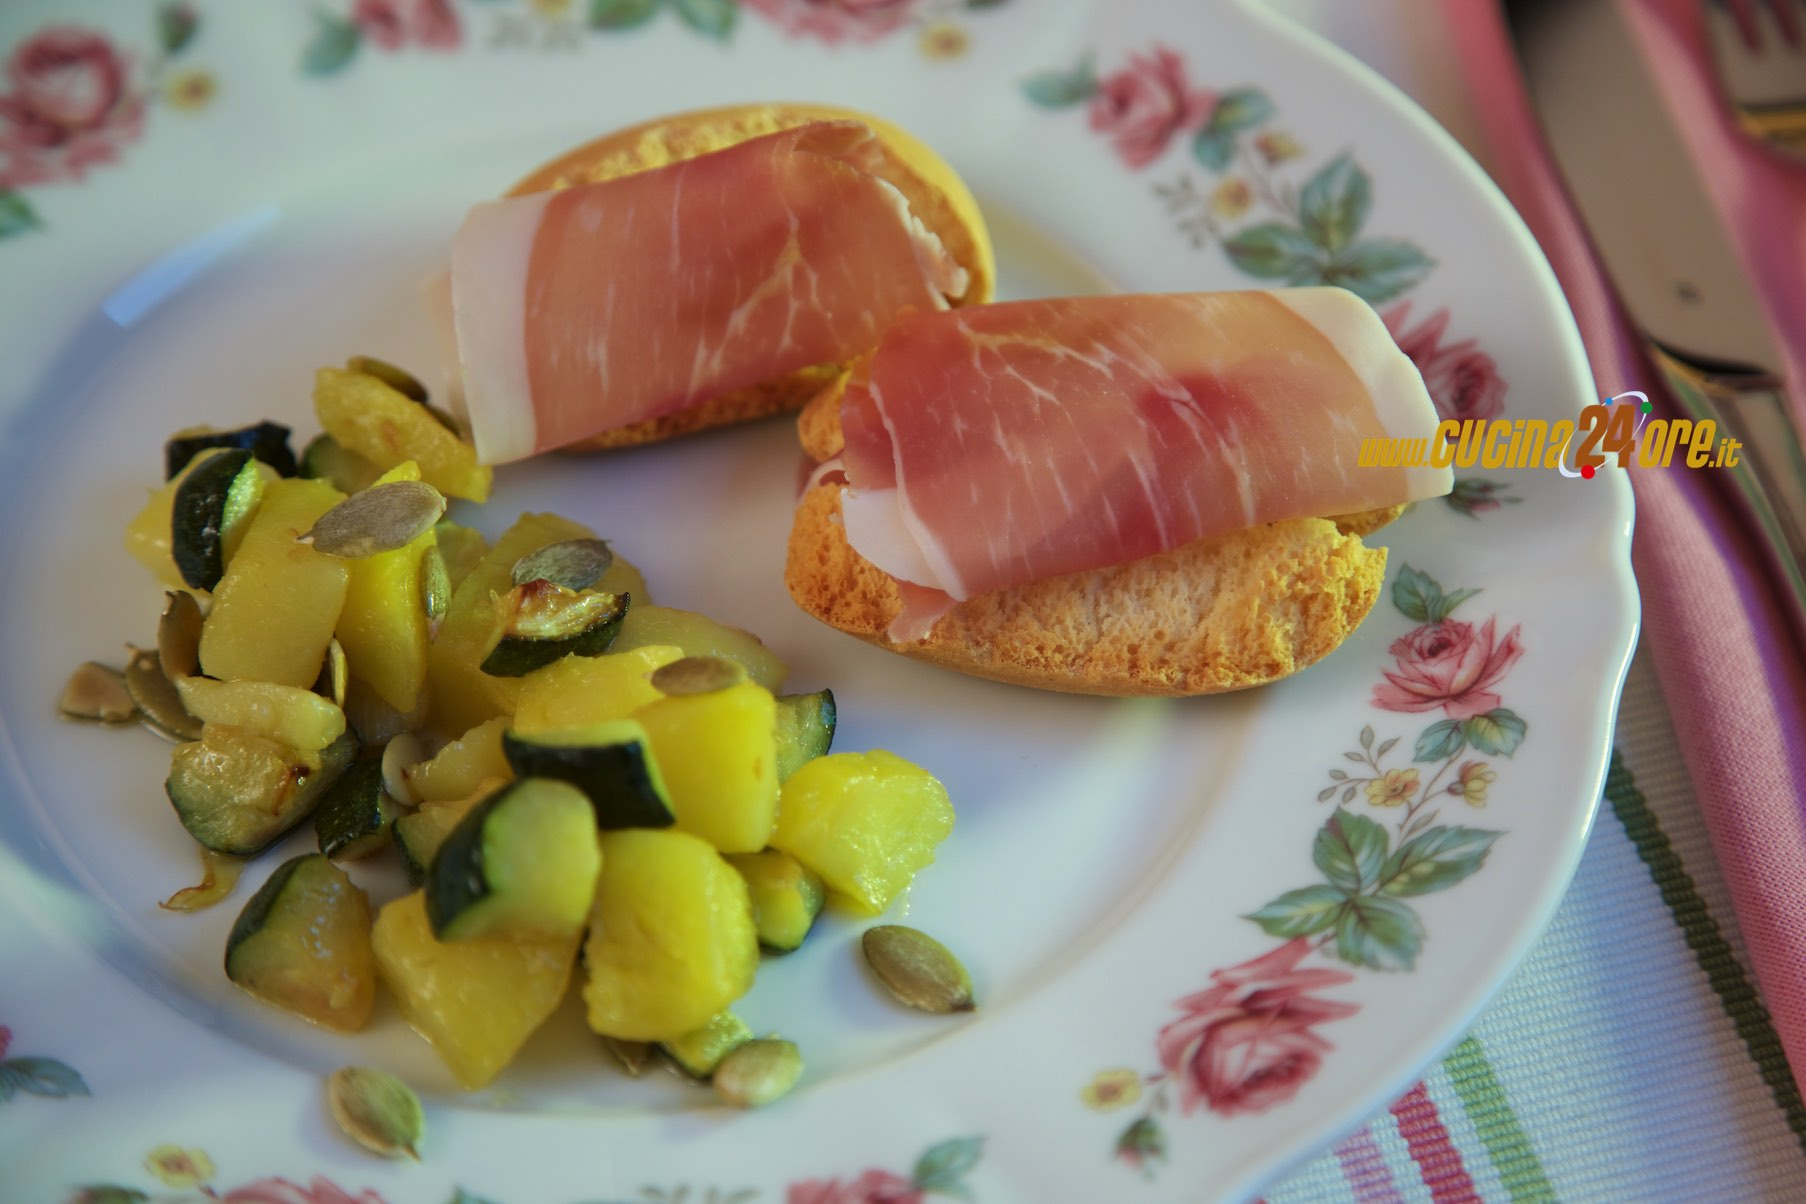 Dadolata di patate e zucchine ai semi di zucca 3 modi per tostare i semi di zucca foto e video - Modi per cucinare patate ...